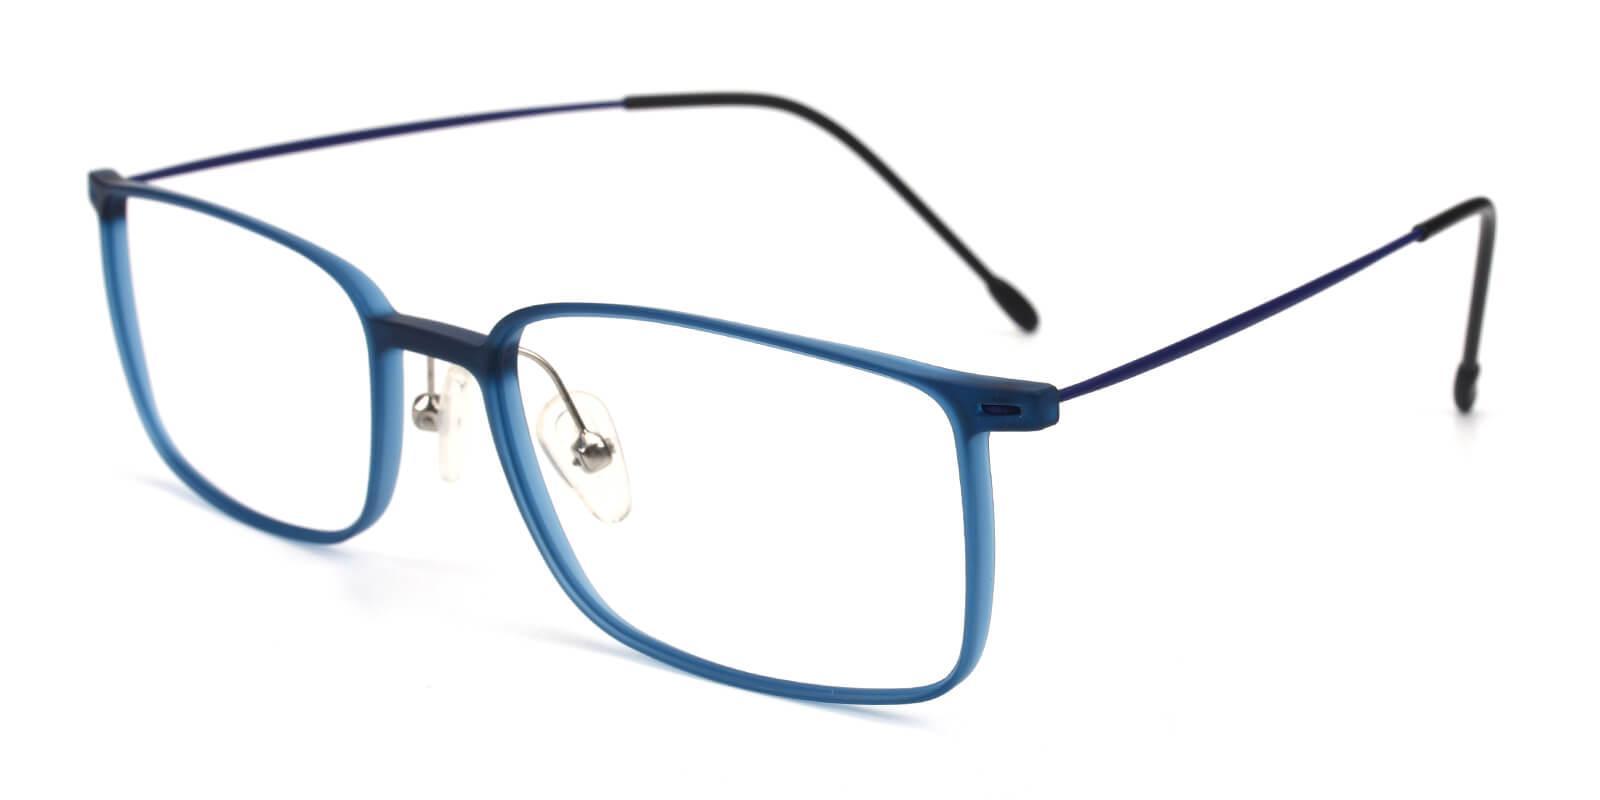 Glory-Blue-Rectangle-Combination-Eyeglasses-additional1